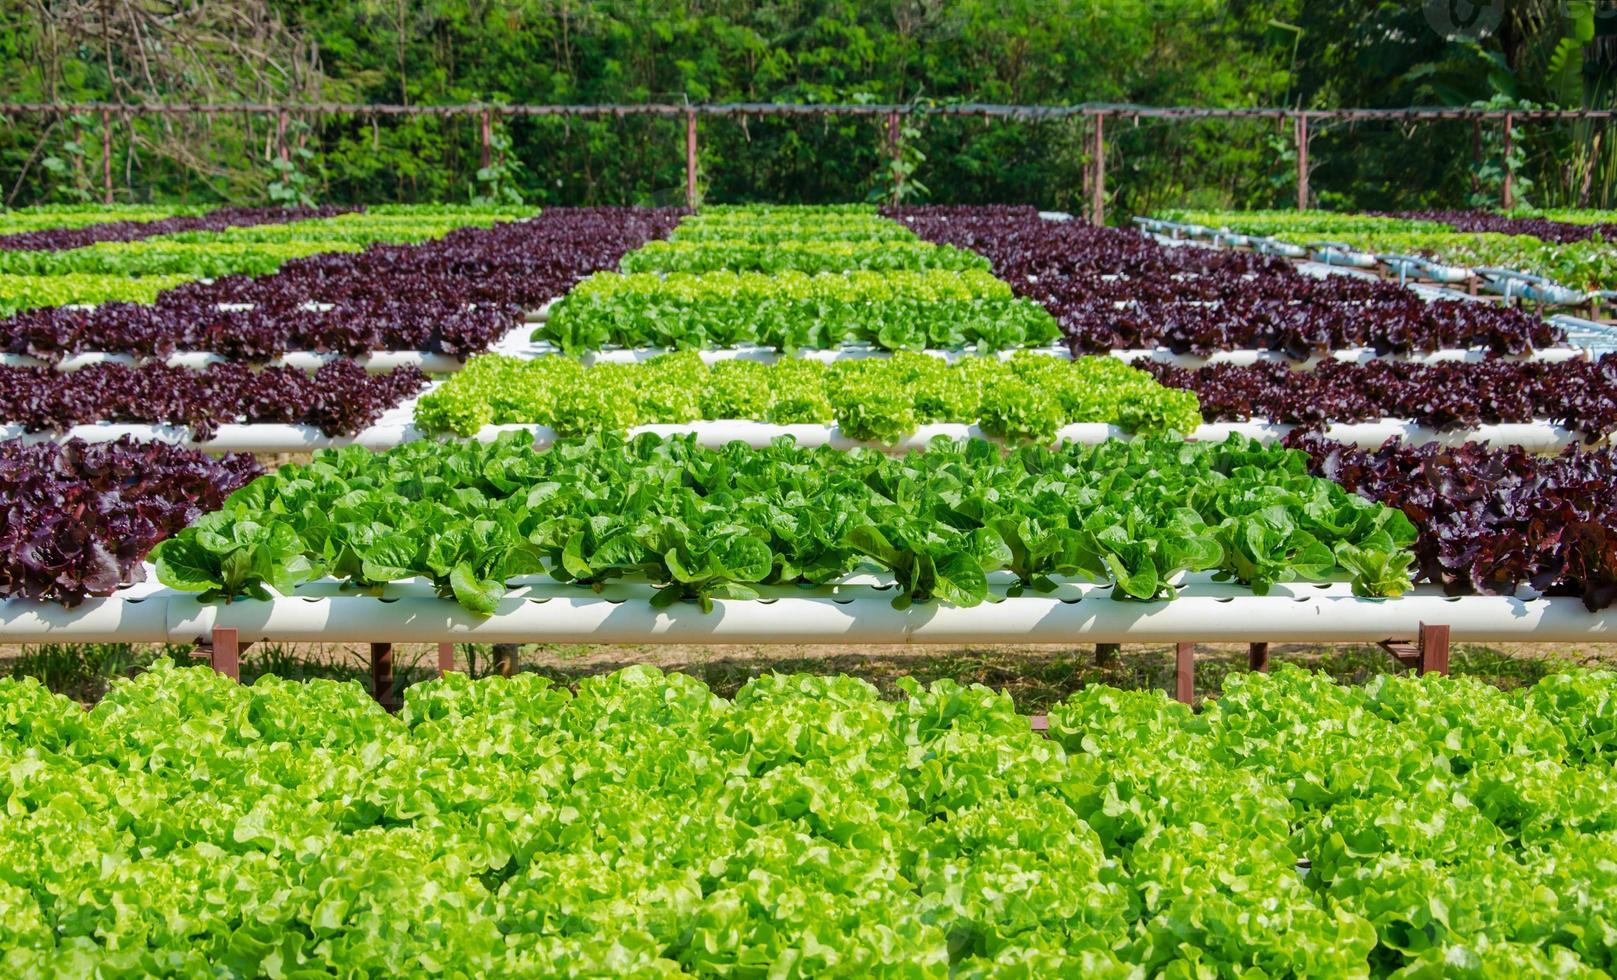 Organic hydroponic vegetable cultivation farm photo